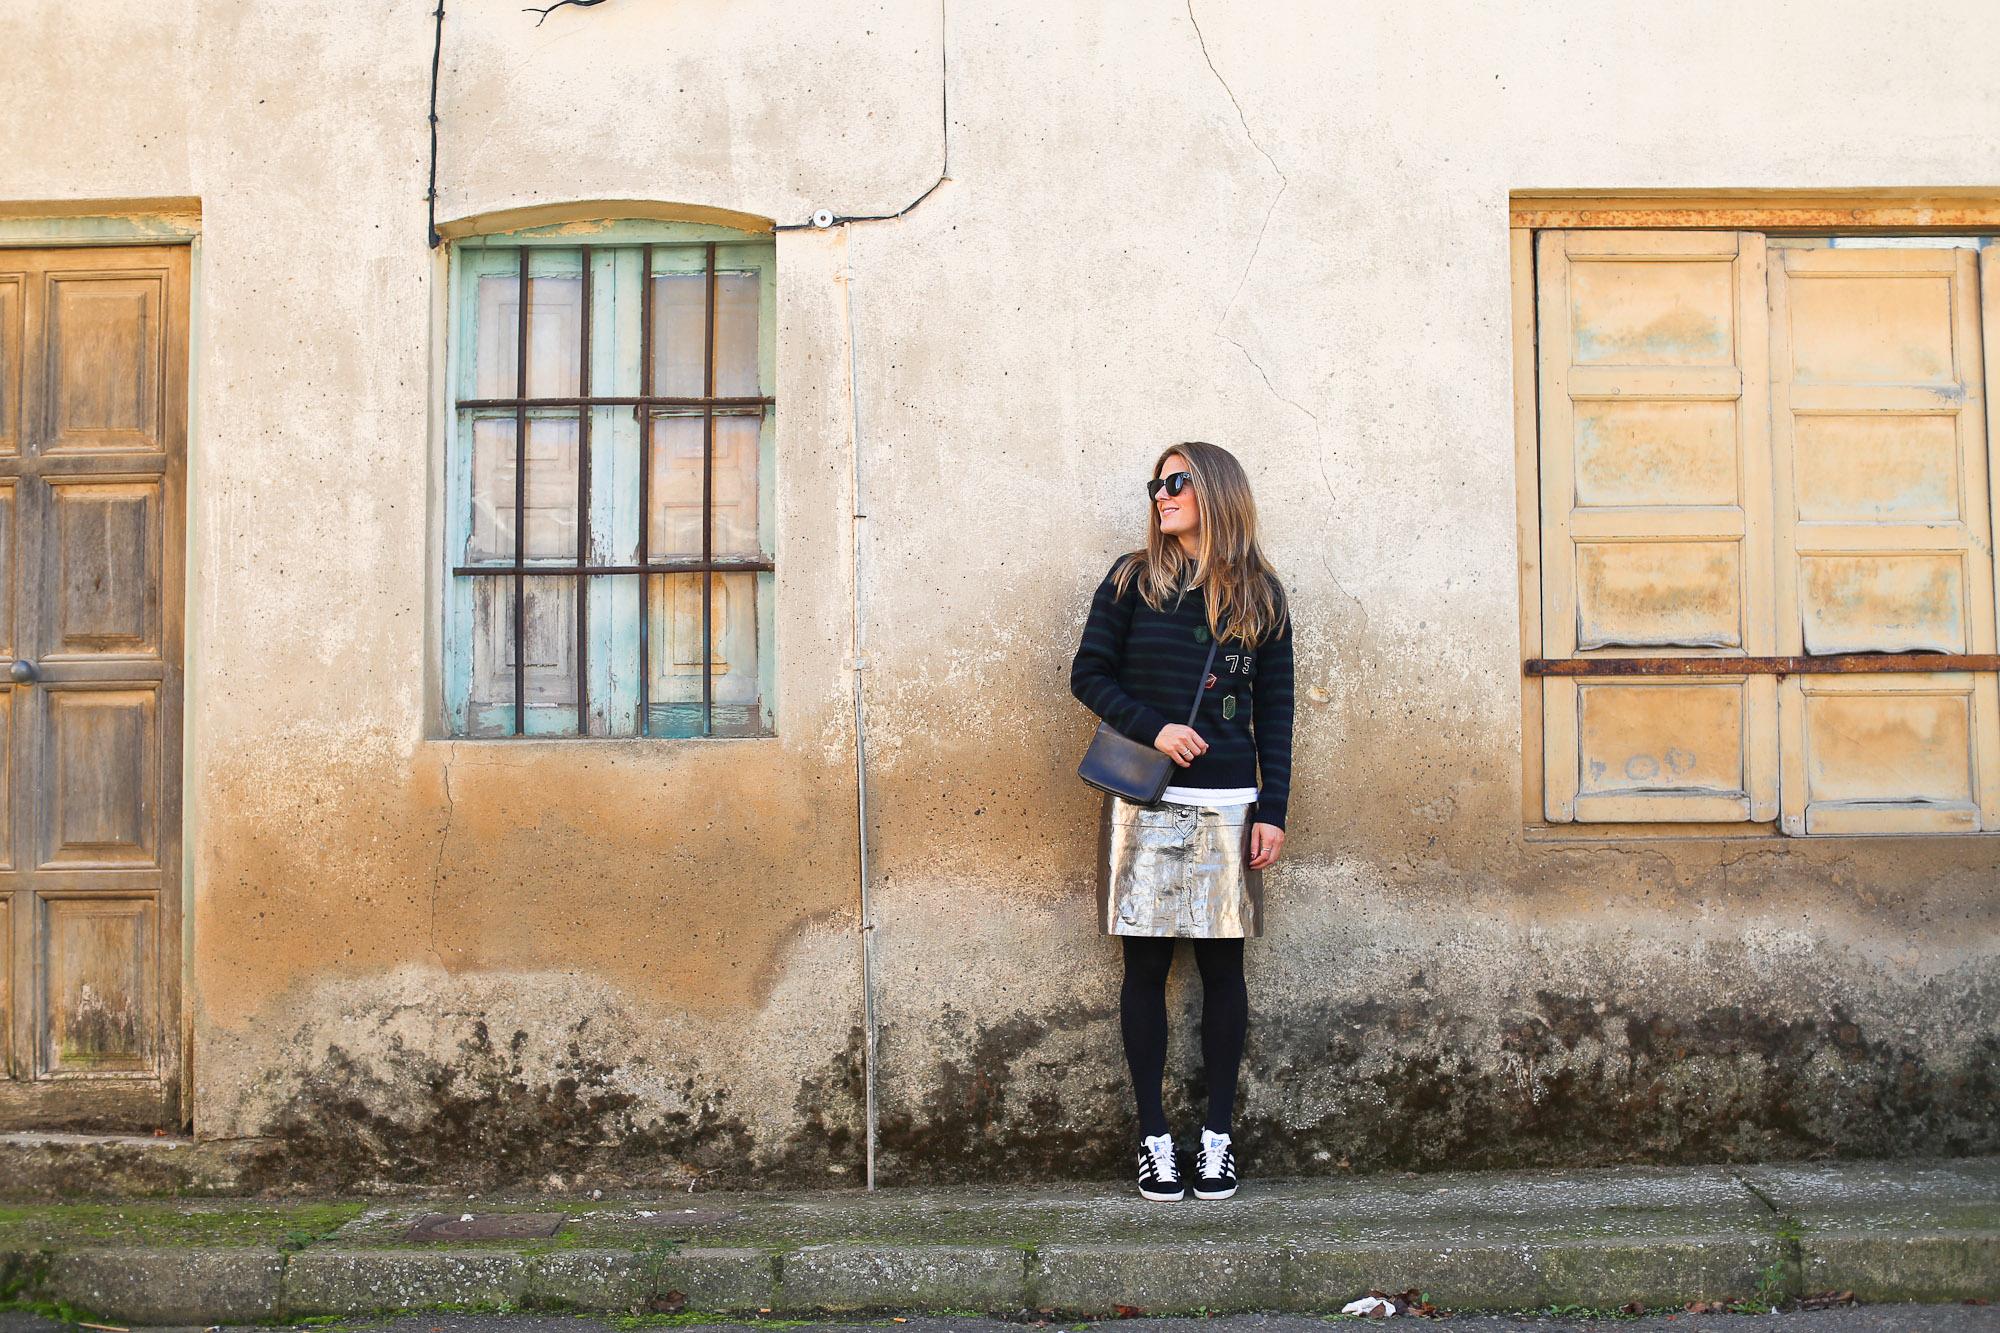 Clochet_streetstyle_fashionblogger_zarametallicleatherskirt_claudiepierlot_stripedknit_adidasgazelle